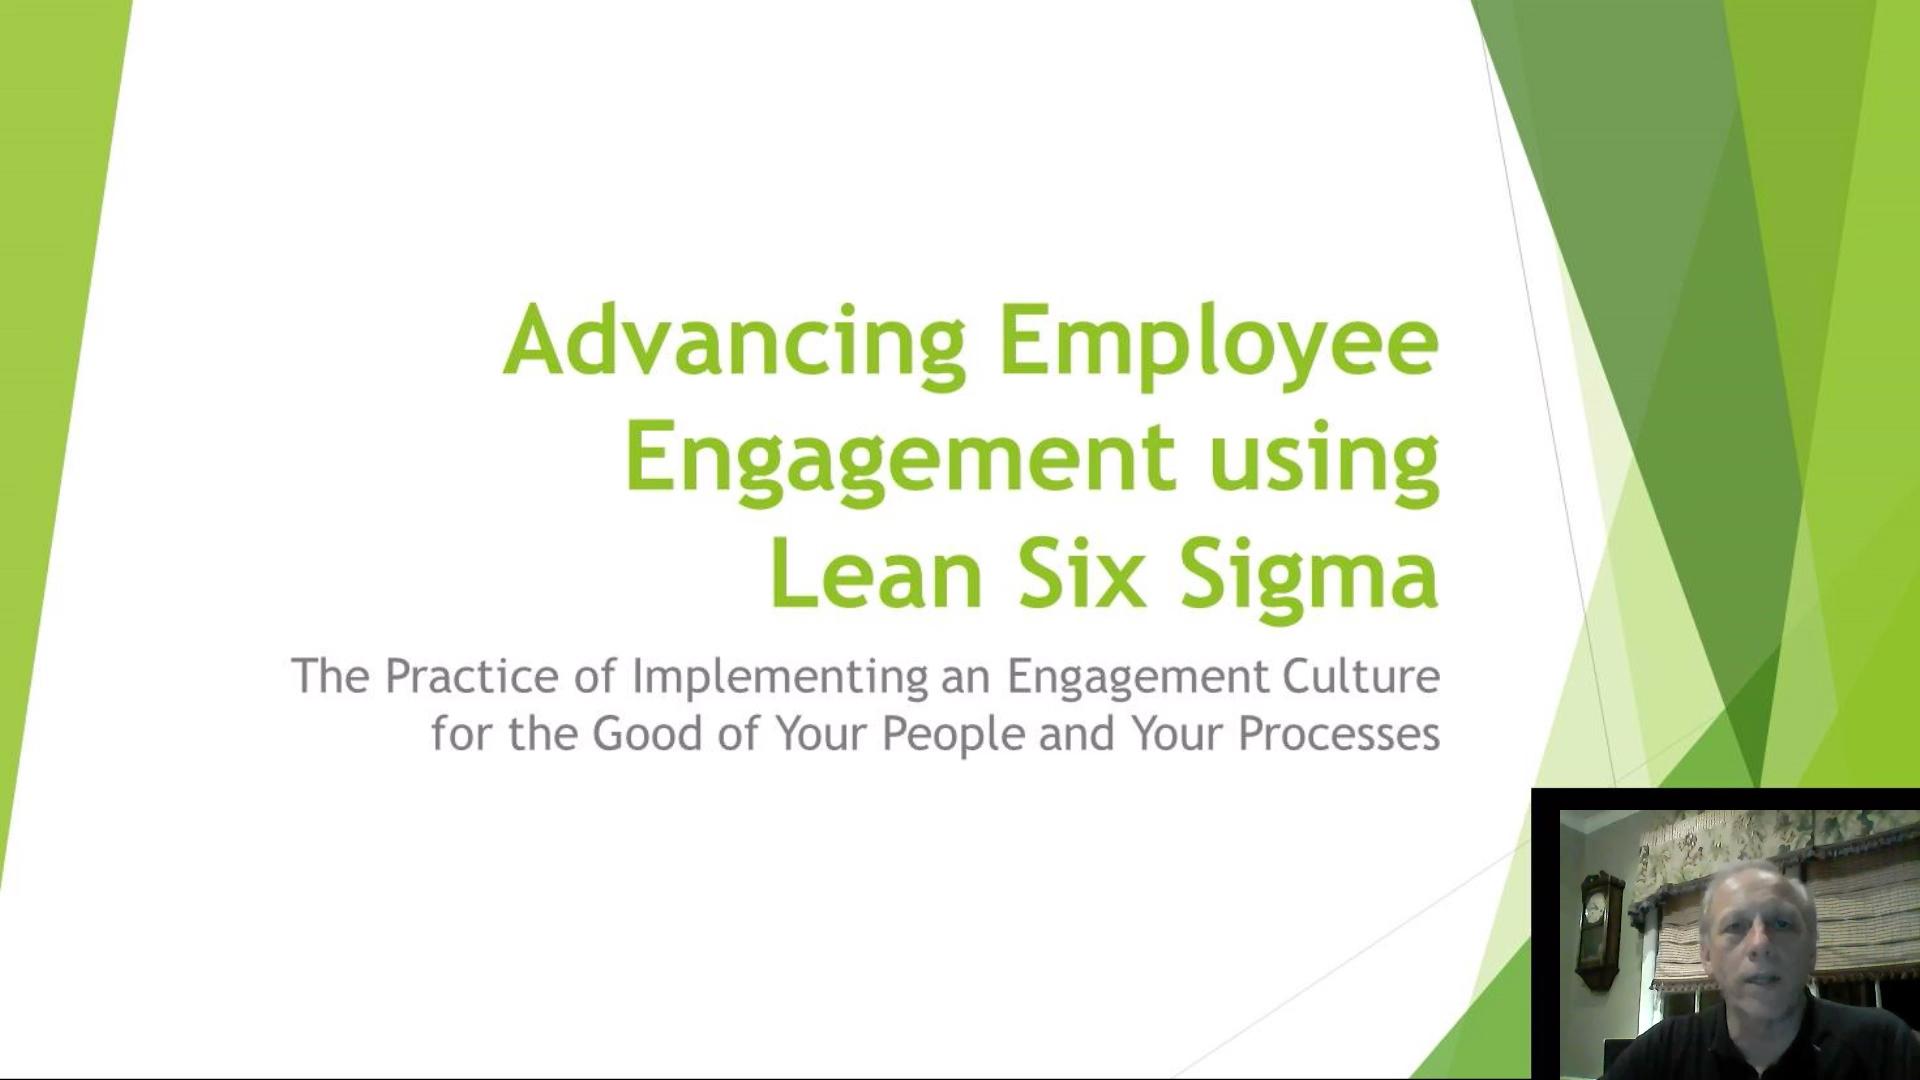 Advancing Employee Engagement Using Lean Six Sigma